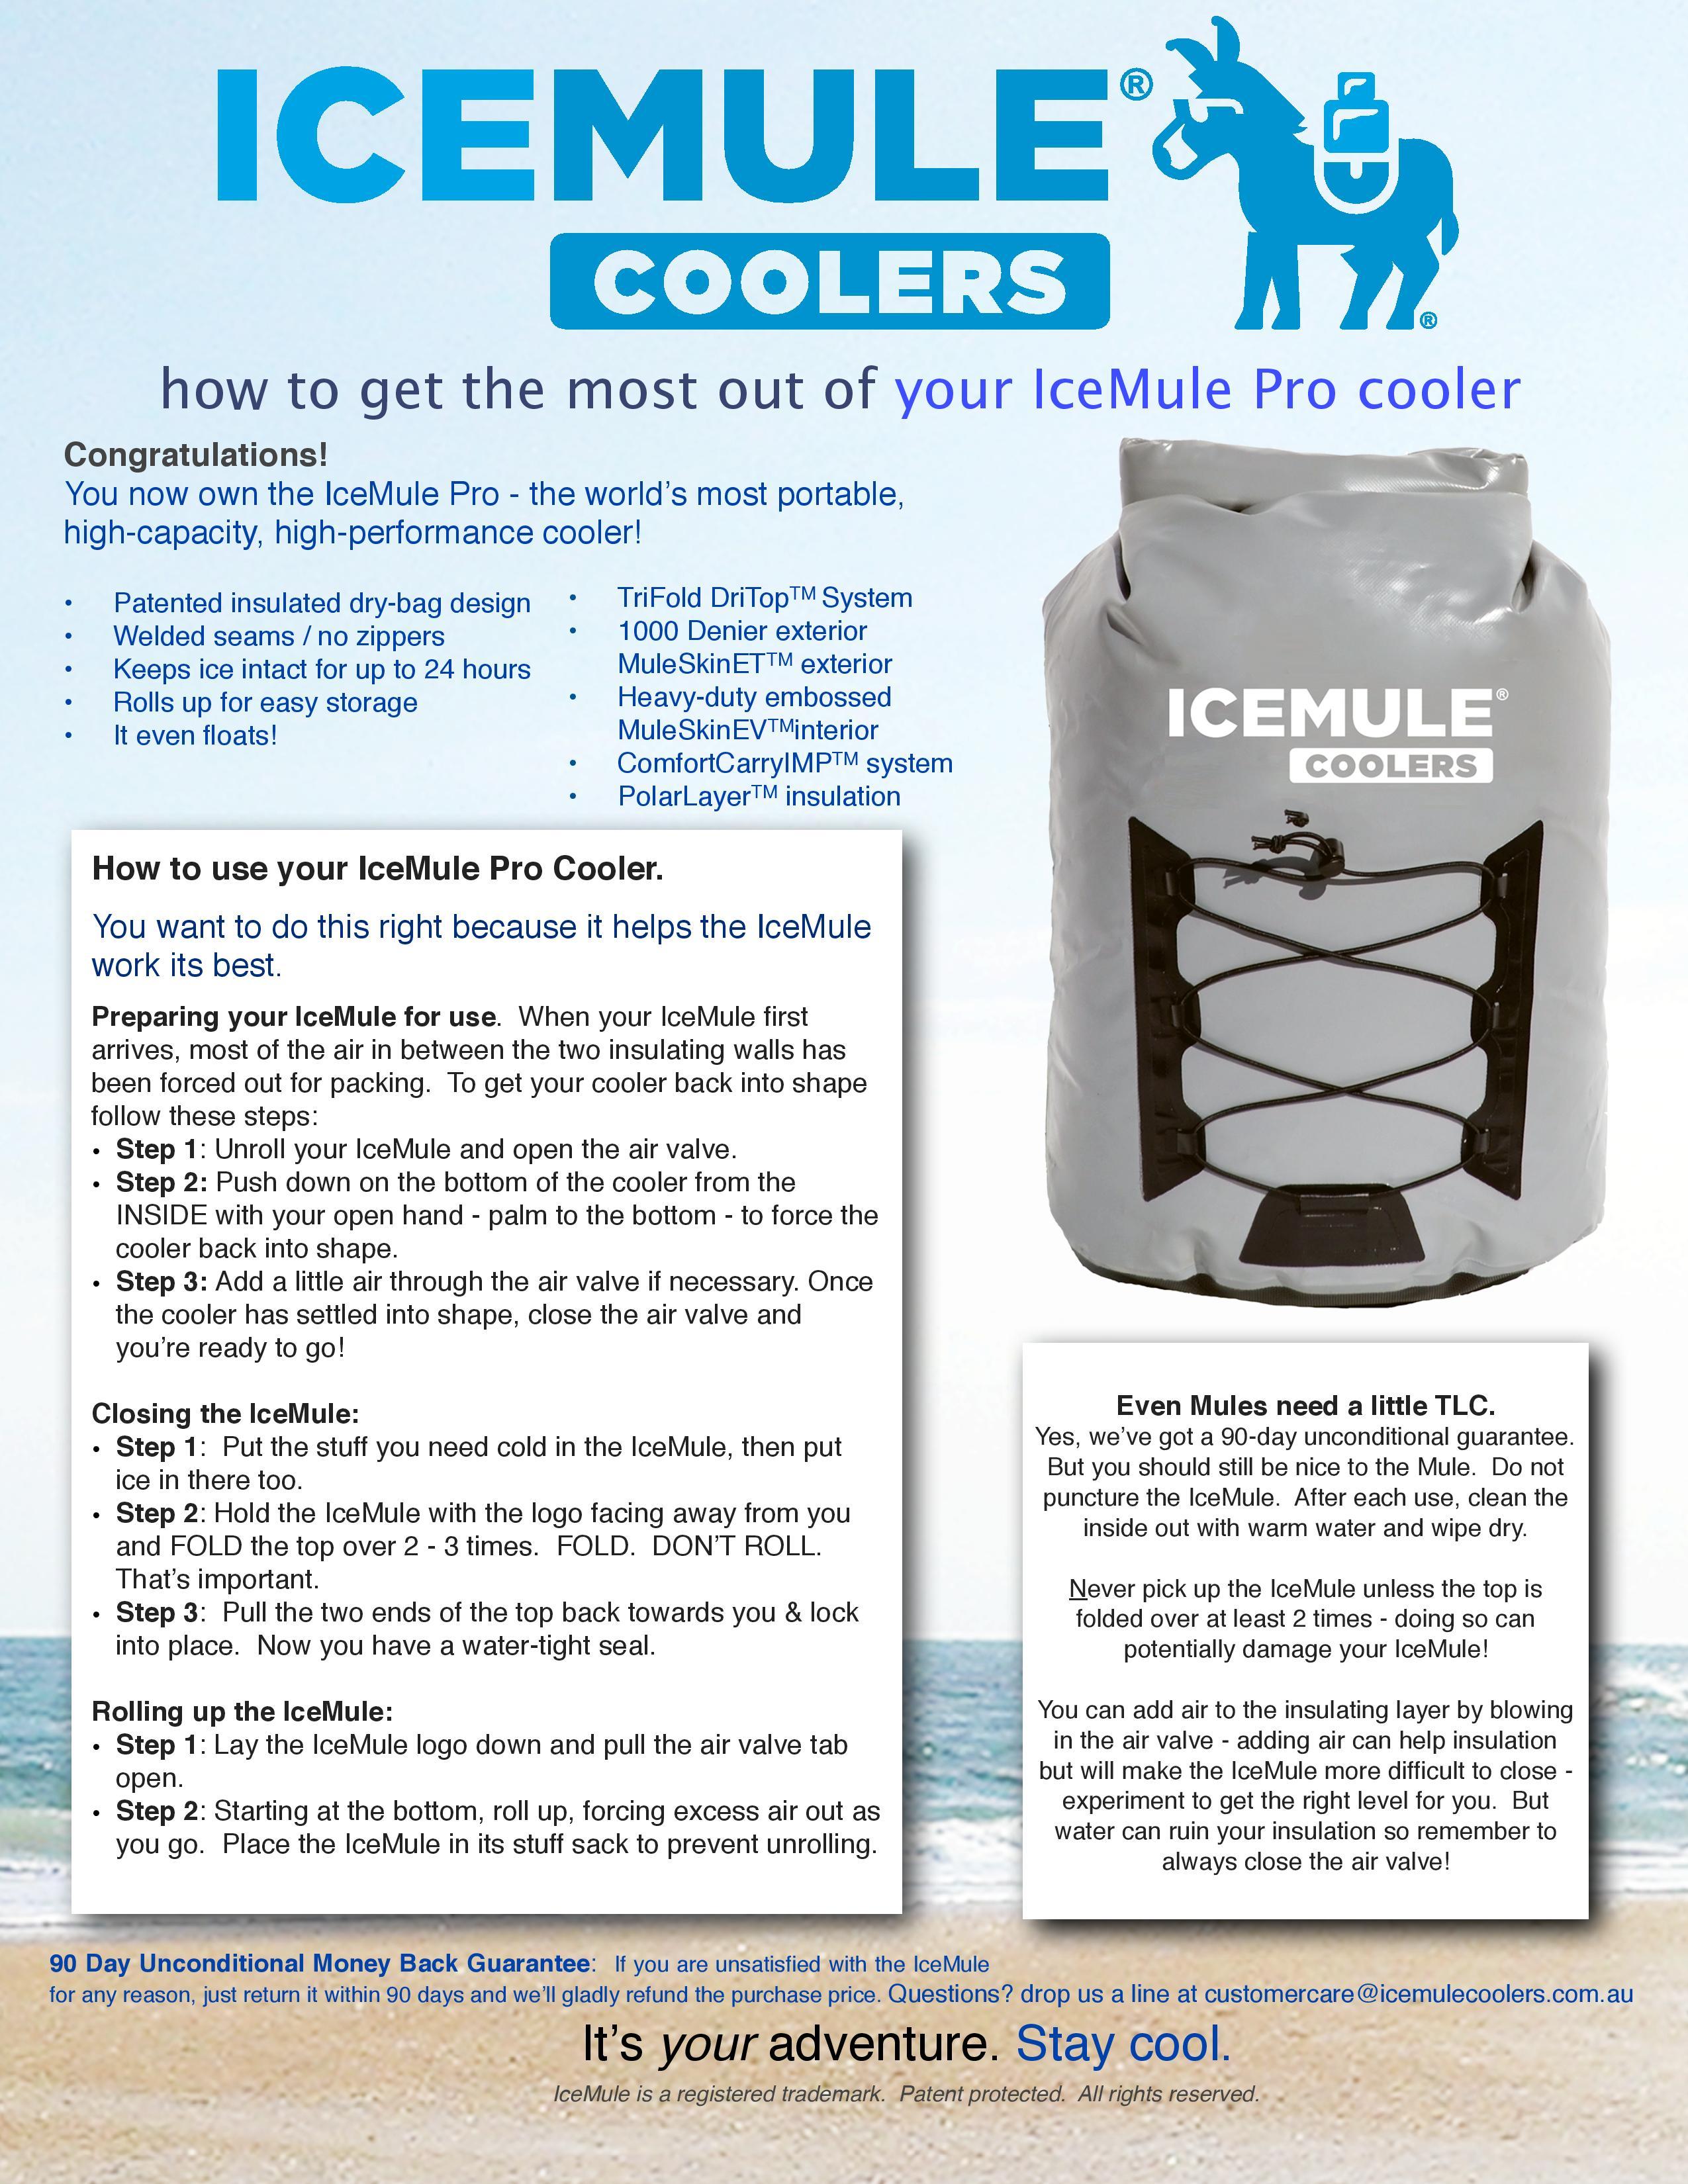 icemule-pro-cooler-owner-s-sheet-2014vf-au-page-001.jpg